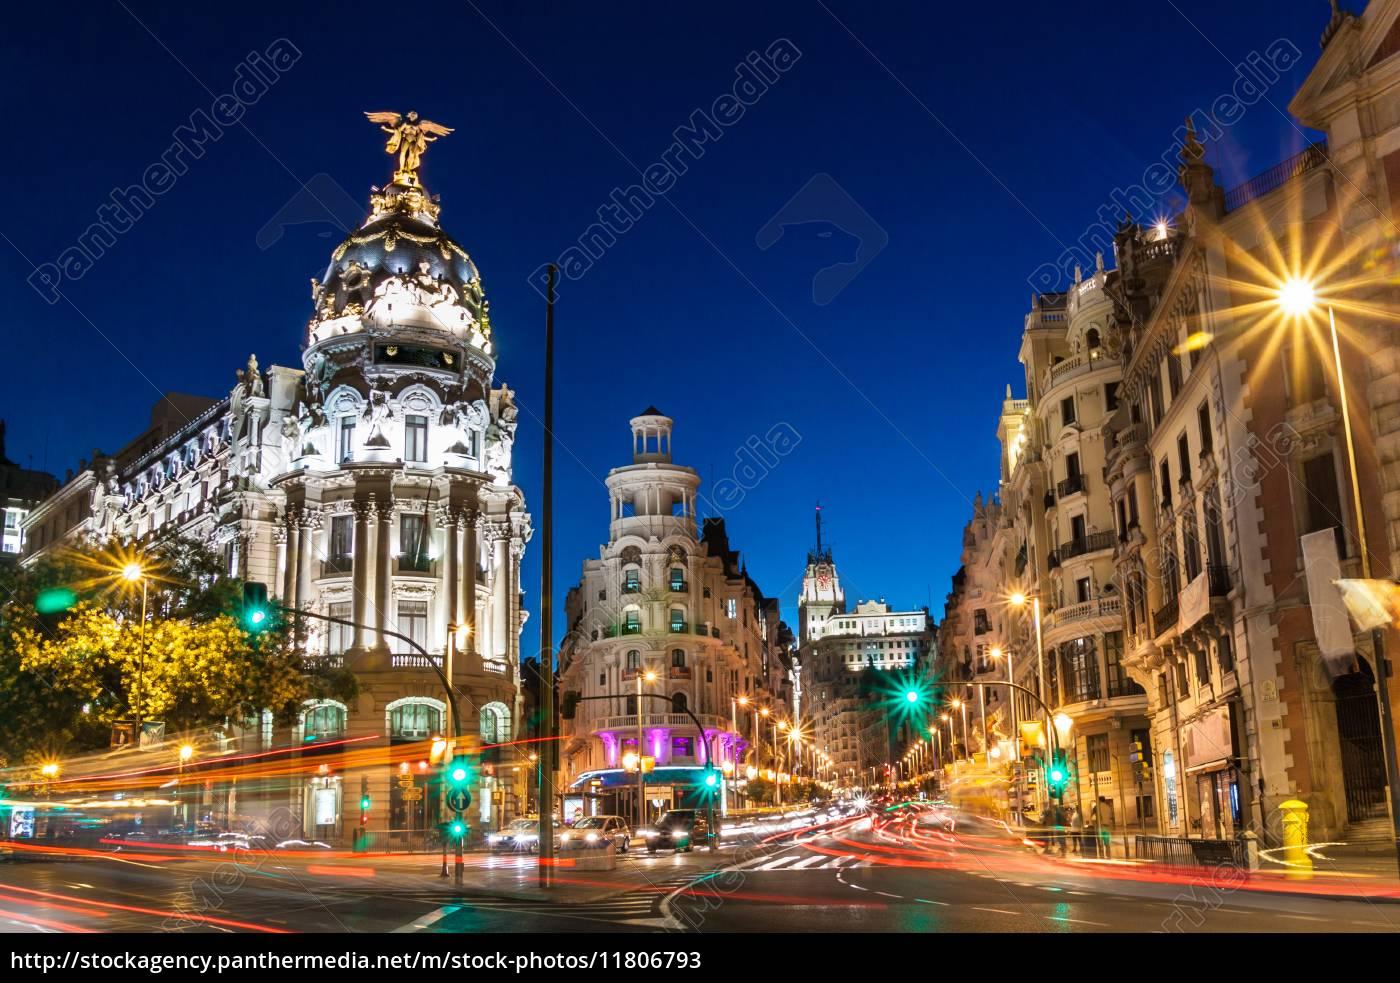 gran, via, in, madrid, spanien, europa. - 11806793